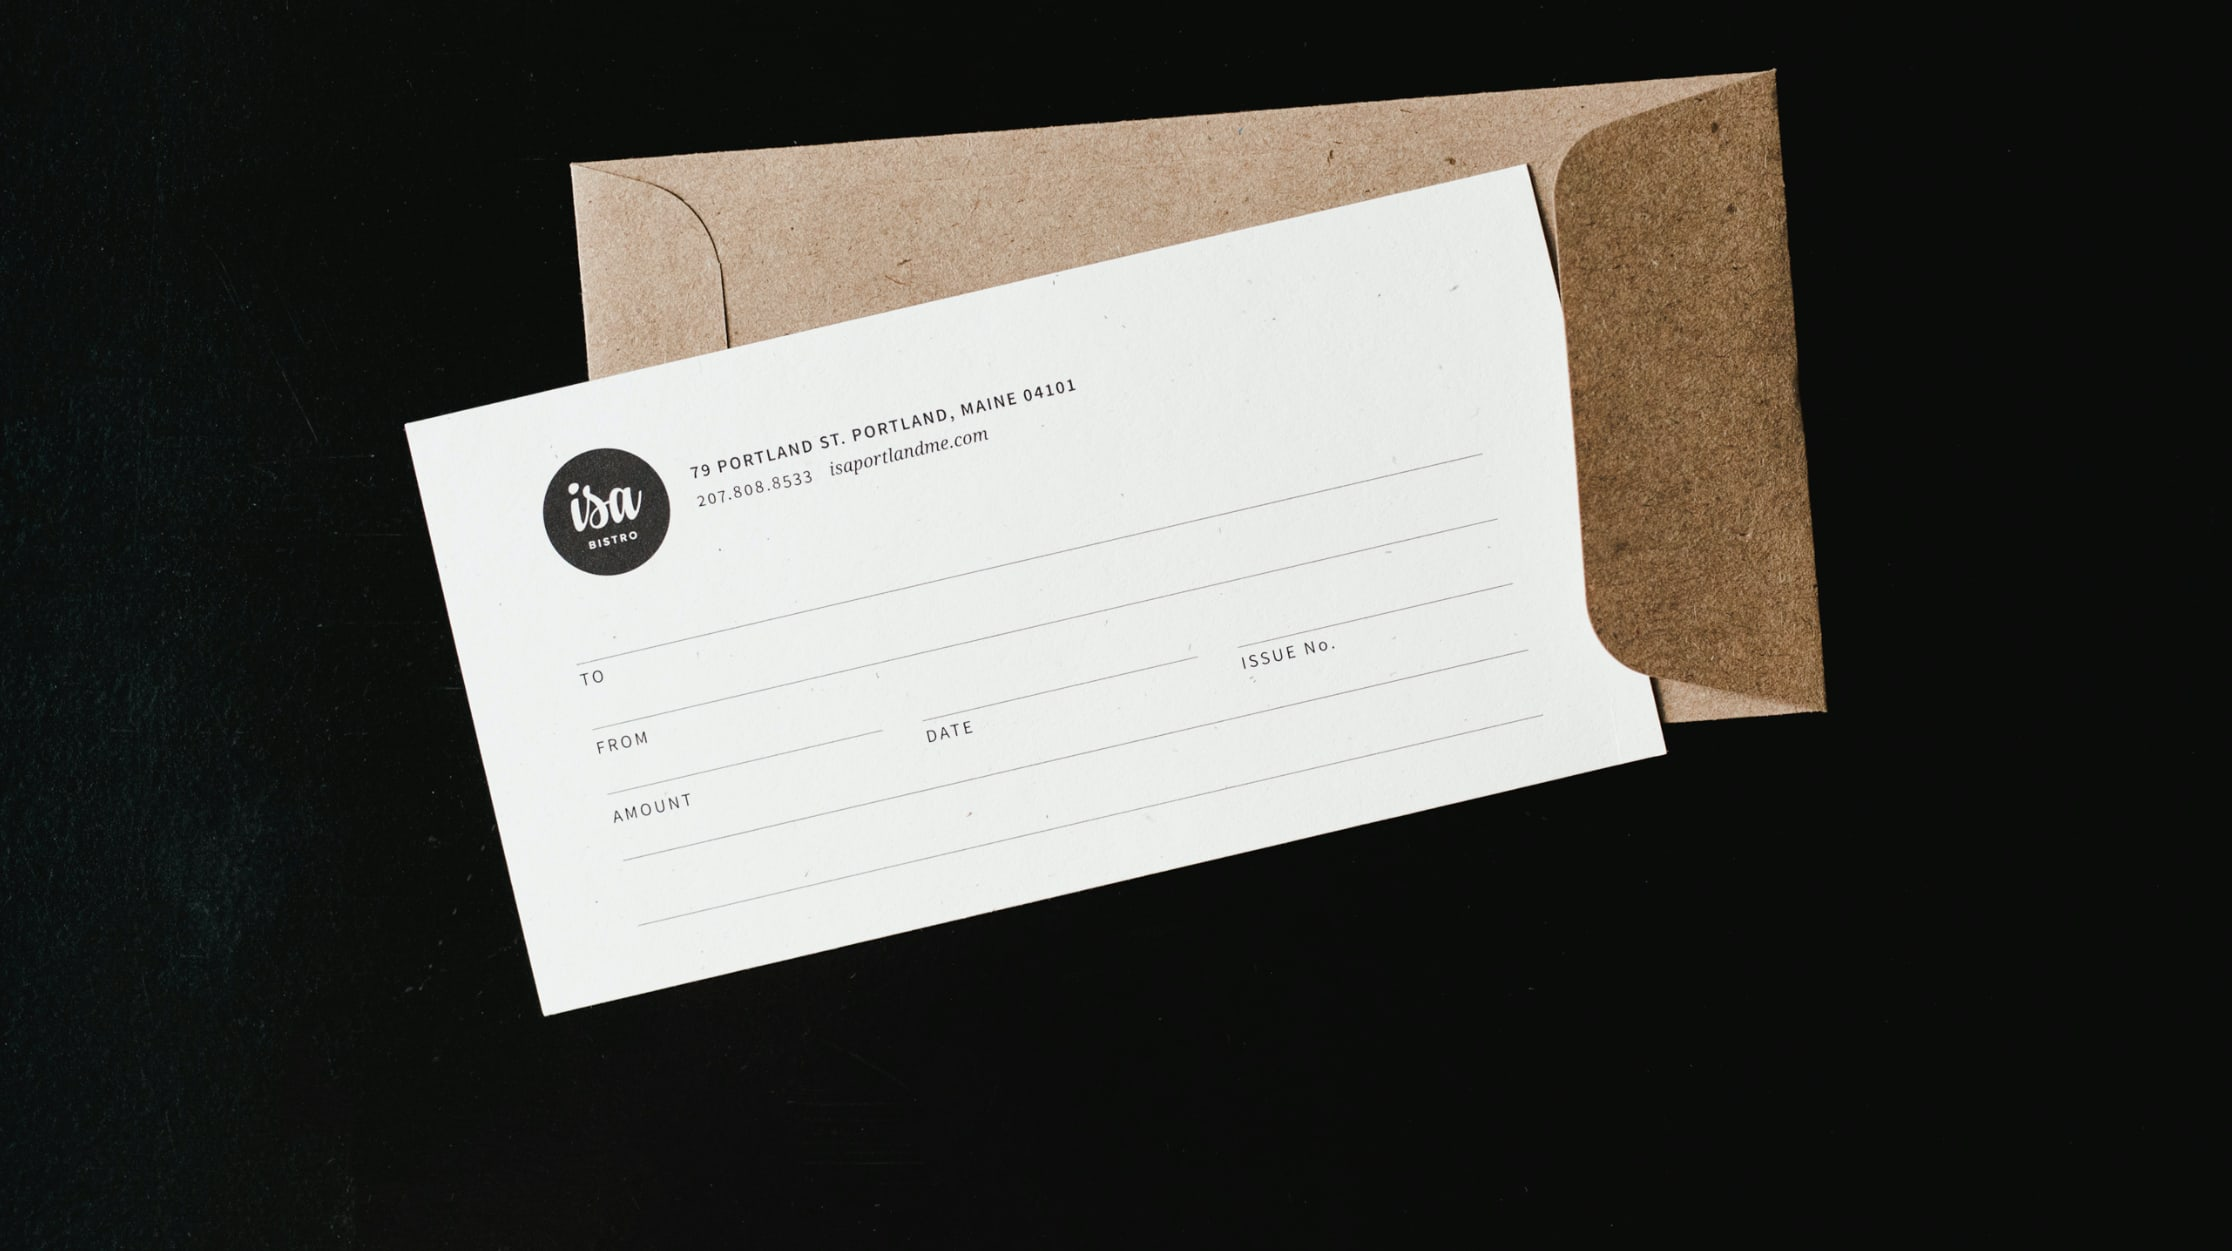 Isa Bistro gift certificate